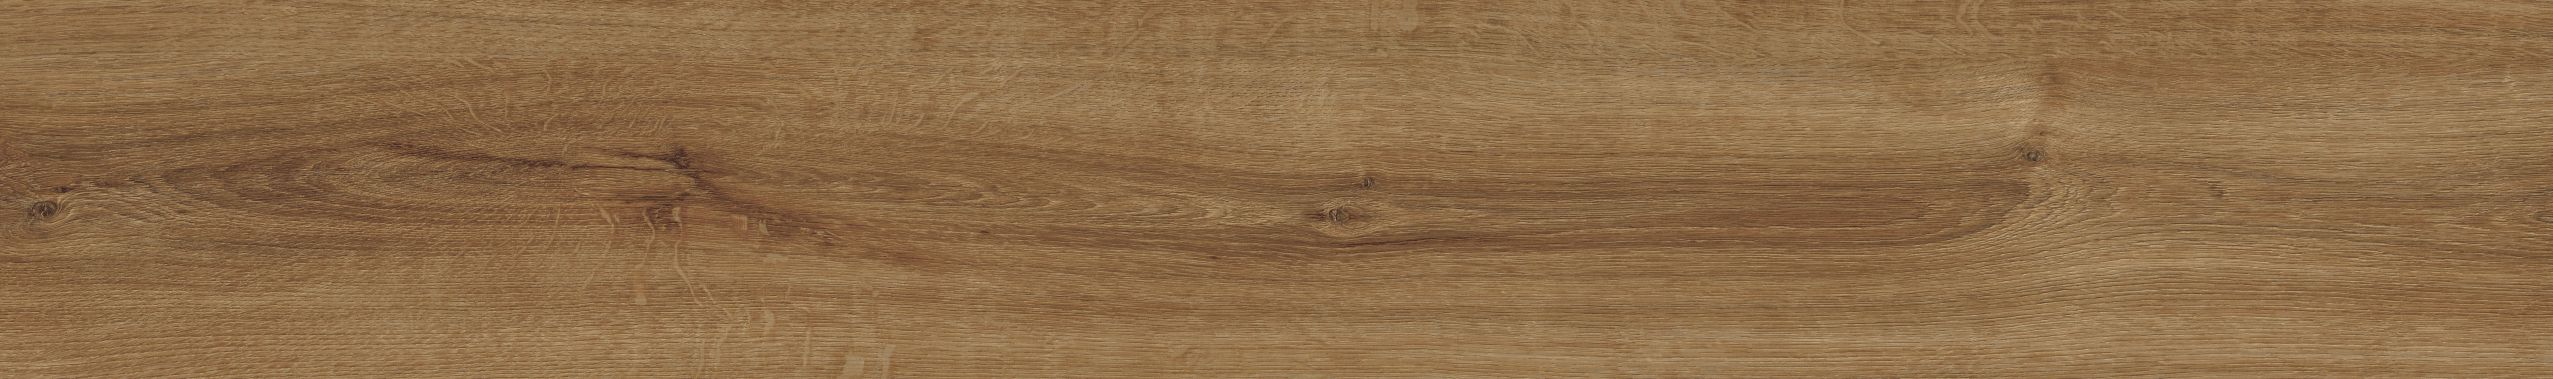 Panele winylowe LVT modulari ® WOOD DRYBACK 19,6 x 132 cm 24820